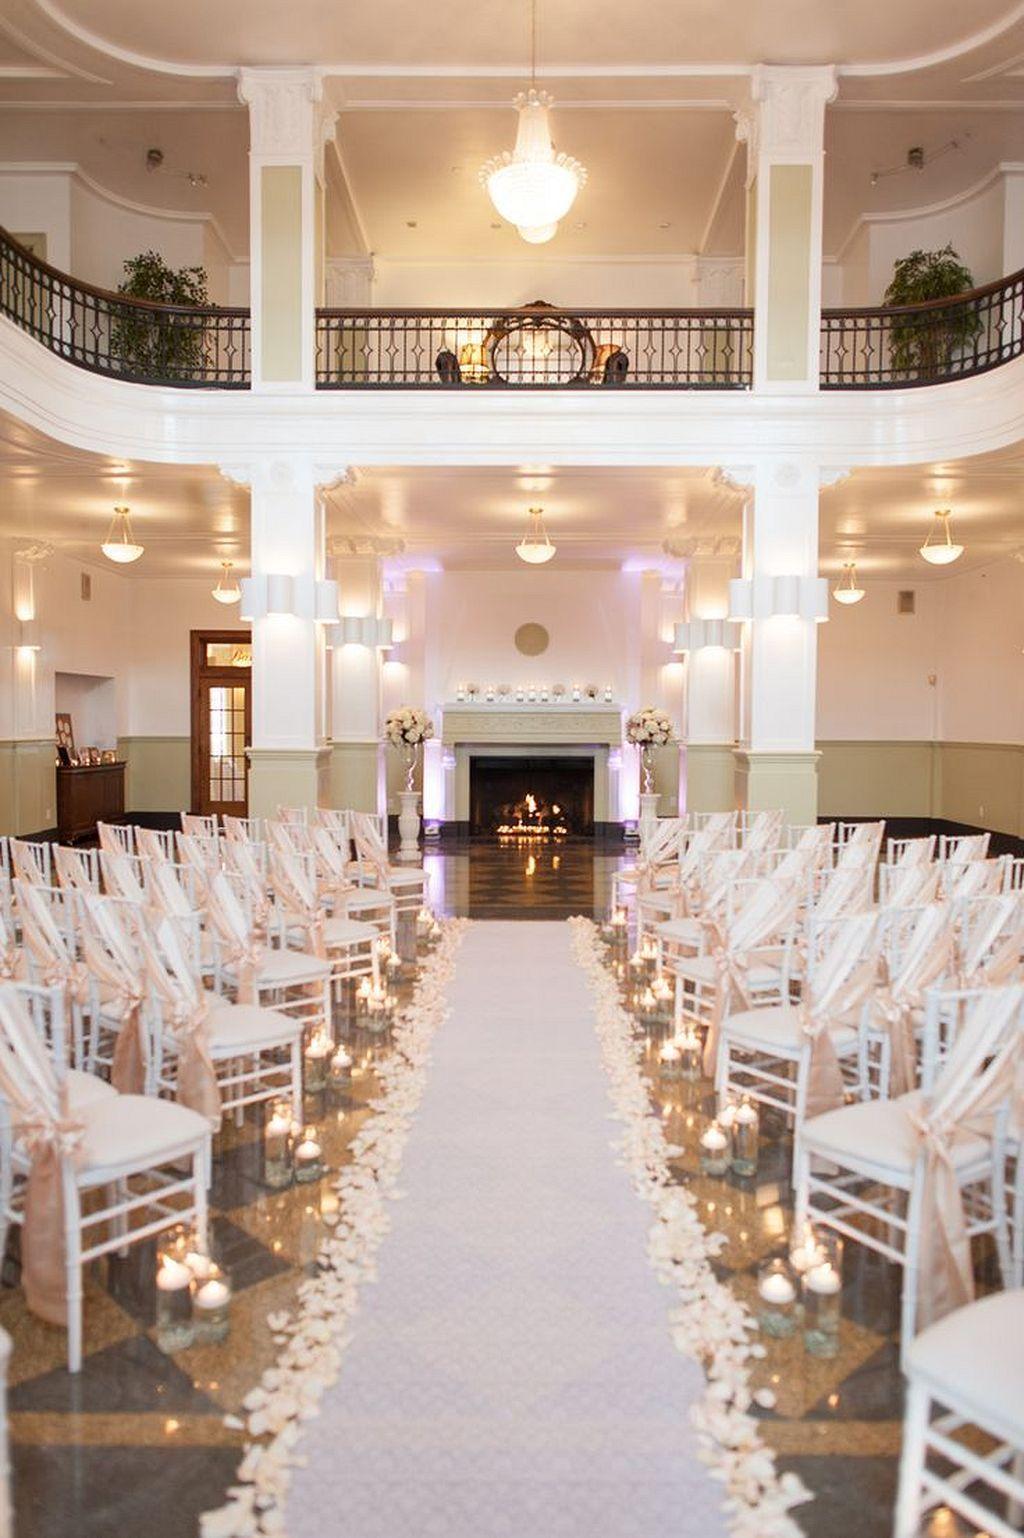 80 Wedding Aisle Decoration Ideas Weddings And R2serverfo Gallery